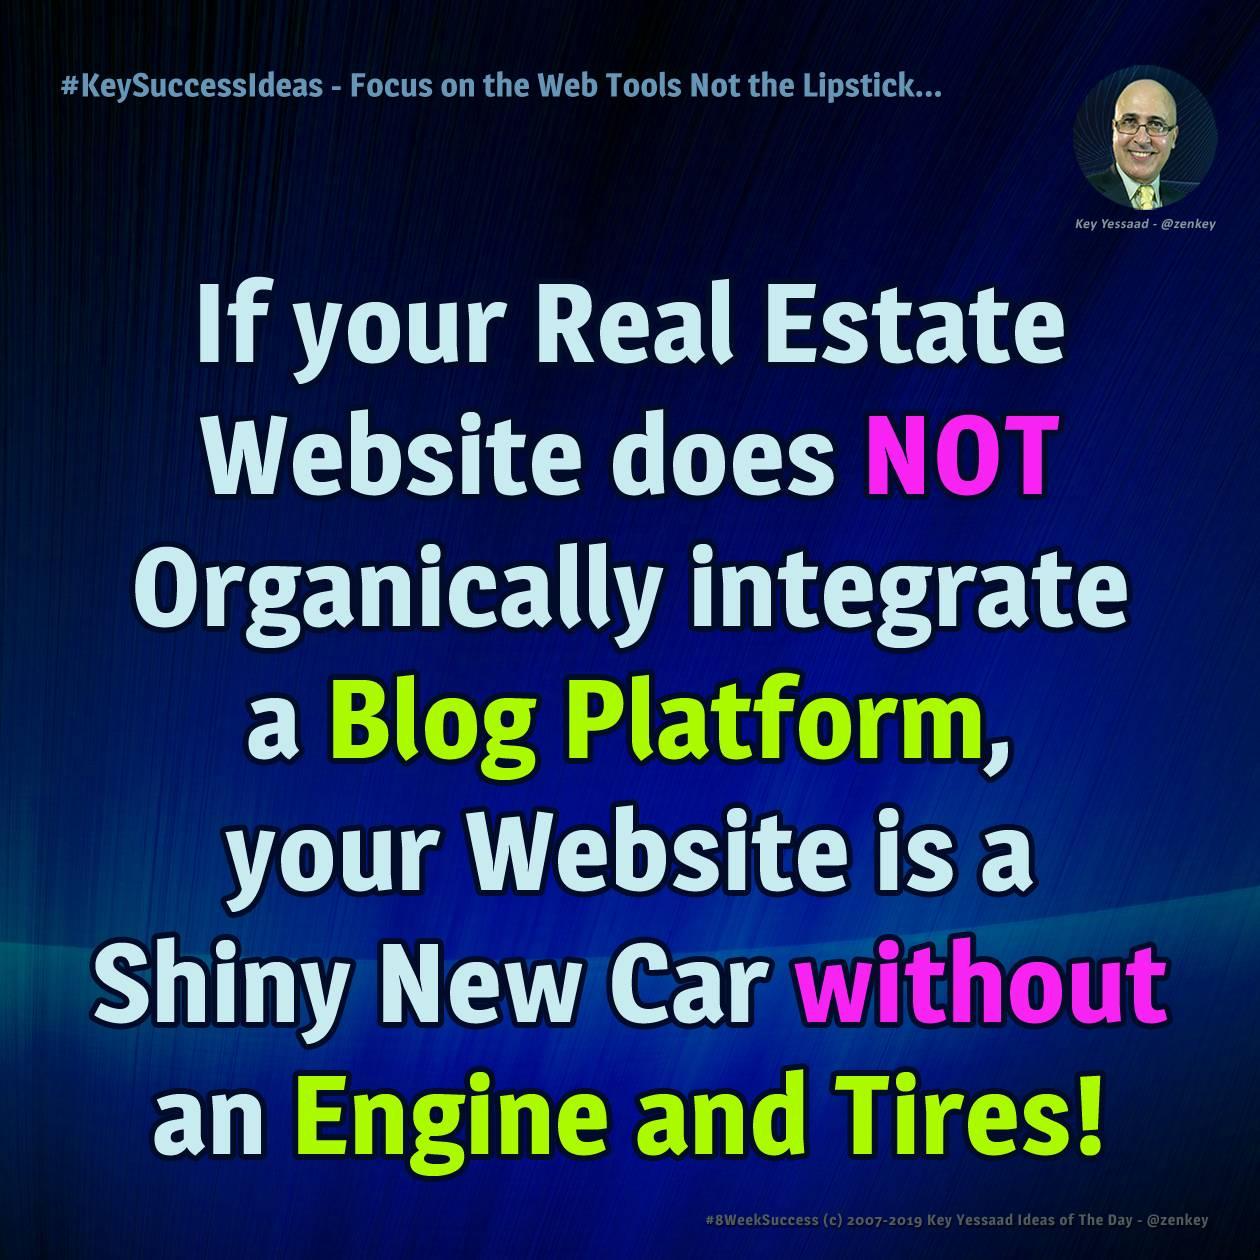 #KeyWorkshops - Focus on the Web Tools Not the Lipstick...